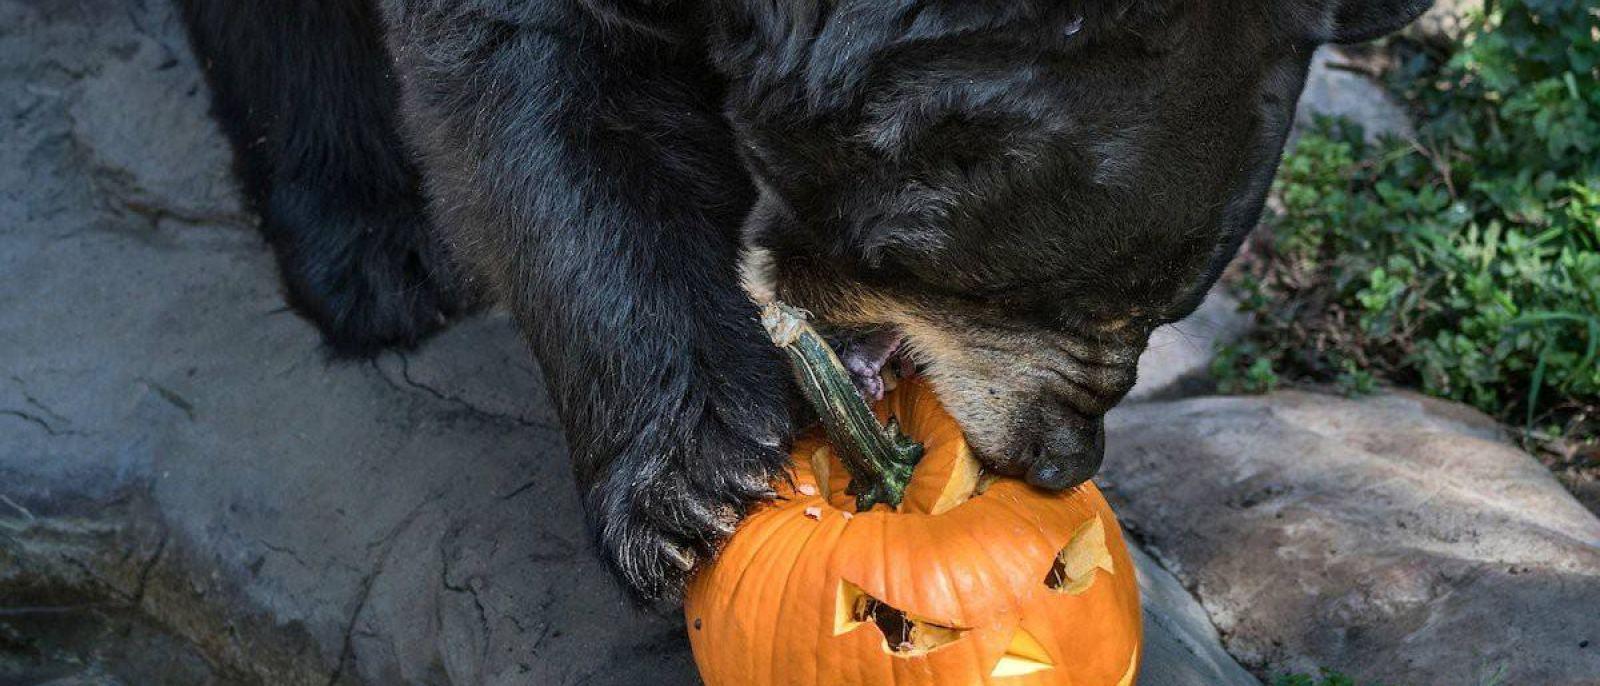 Bear enjoys a pumpkin during Boo at the LA Zoo